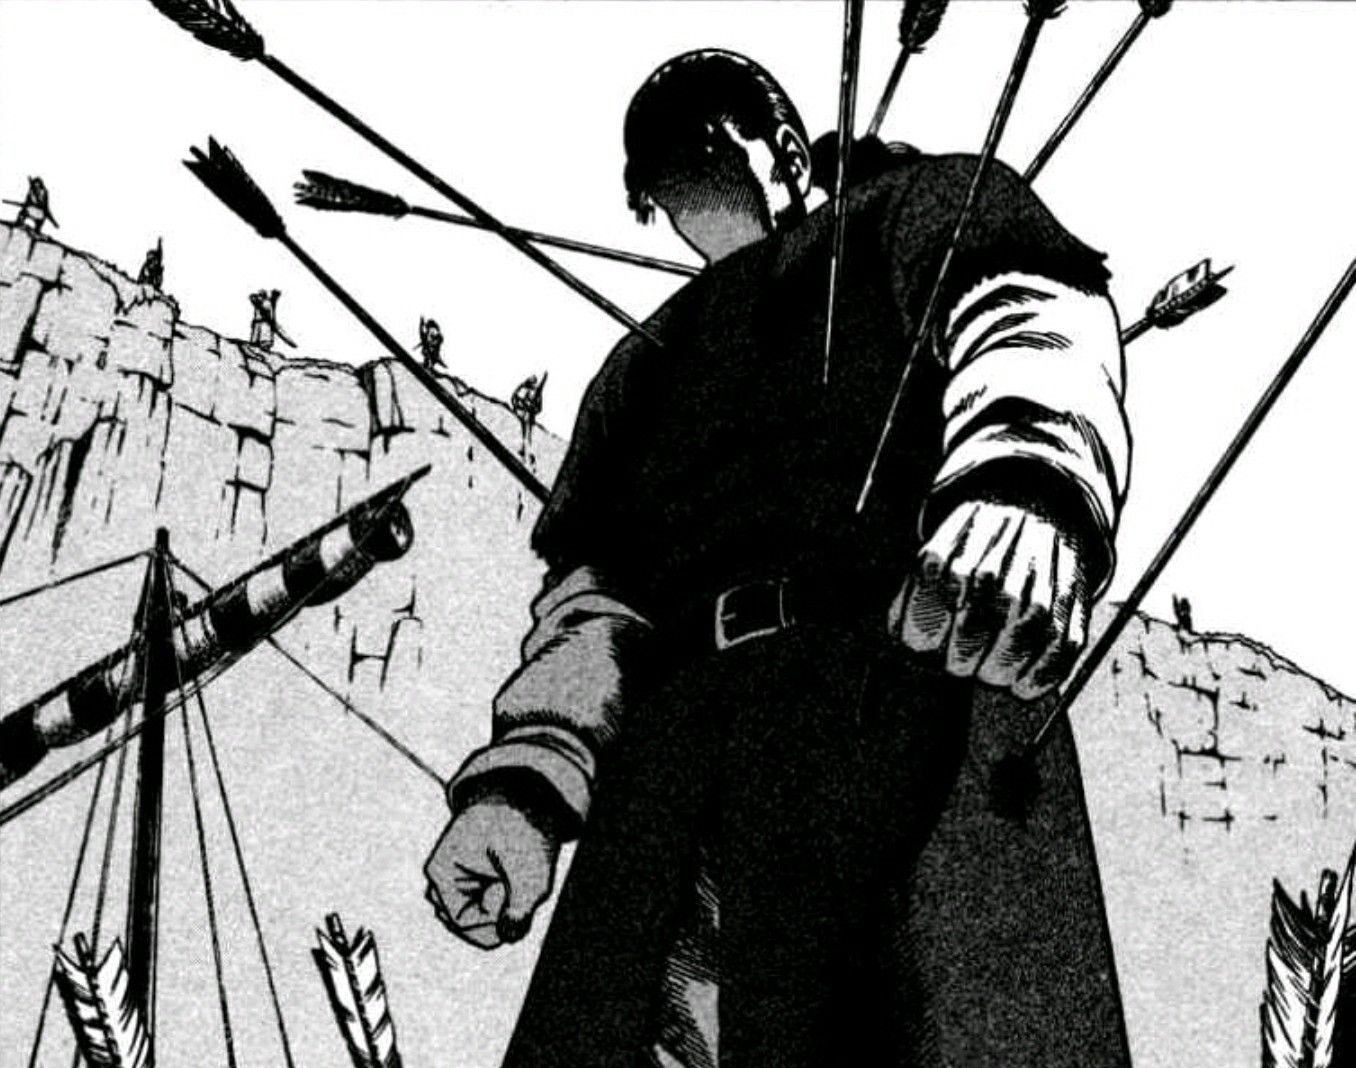 Pin by Fourth on Manga Images Vinland saga, Manga comics